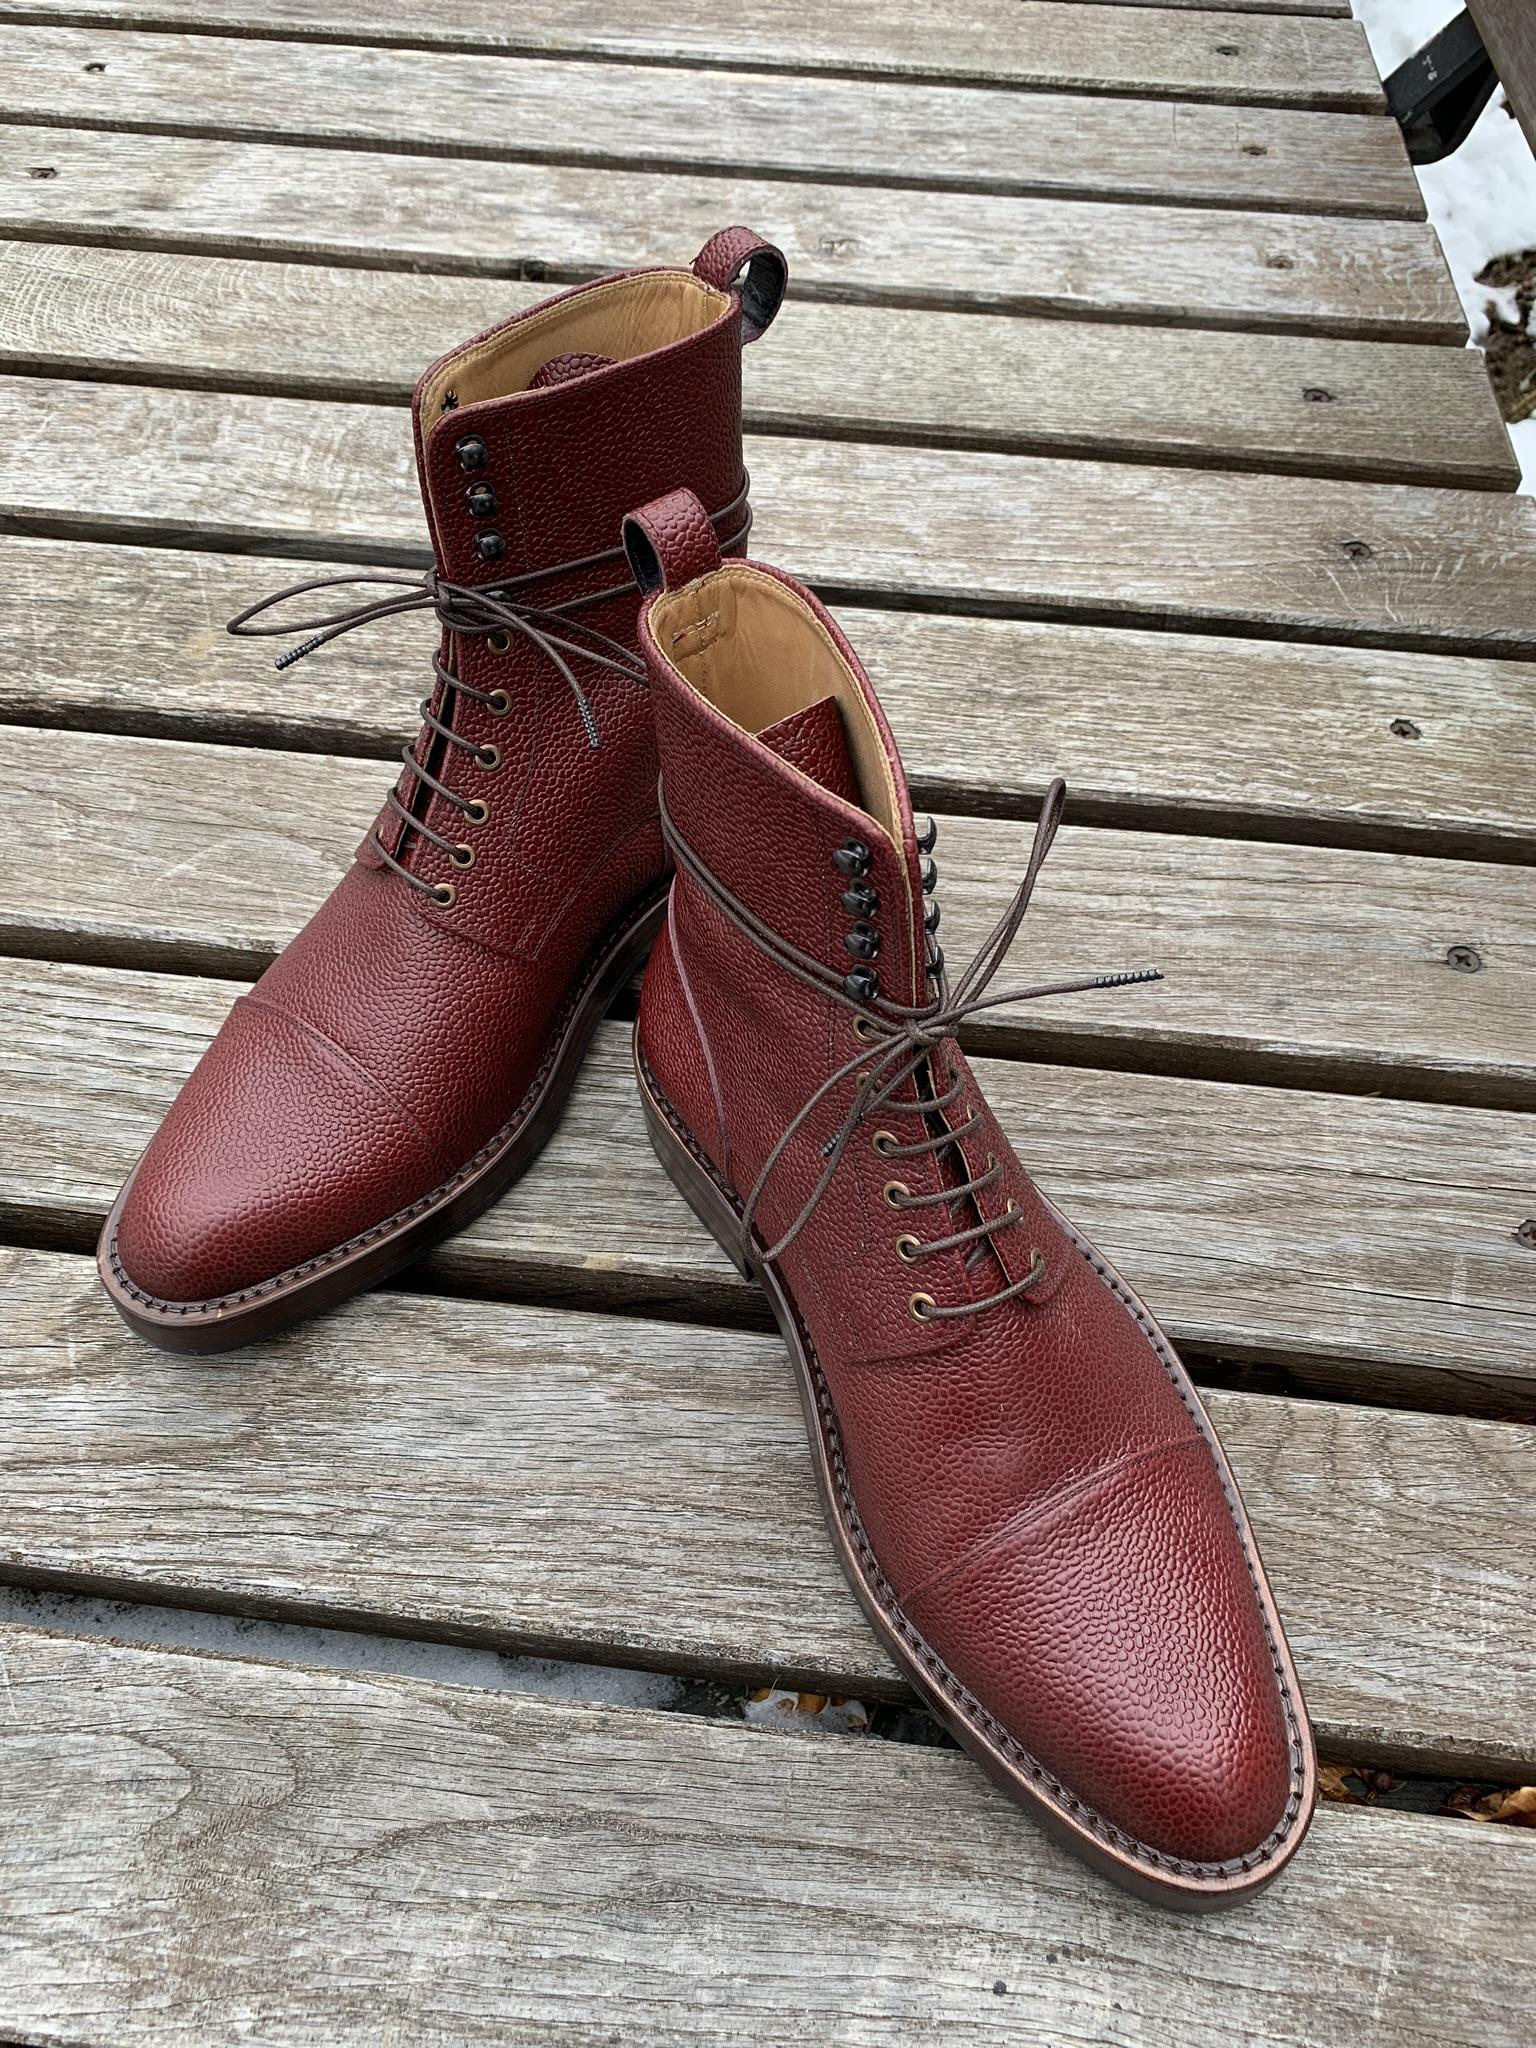 Leather-Boots-London-Scotch-Burgundy-Gal10